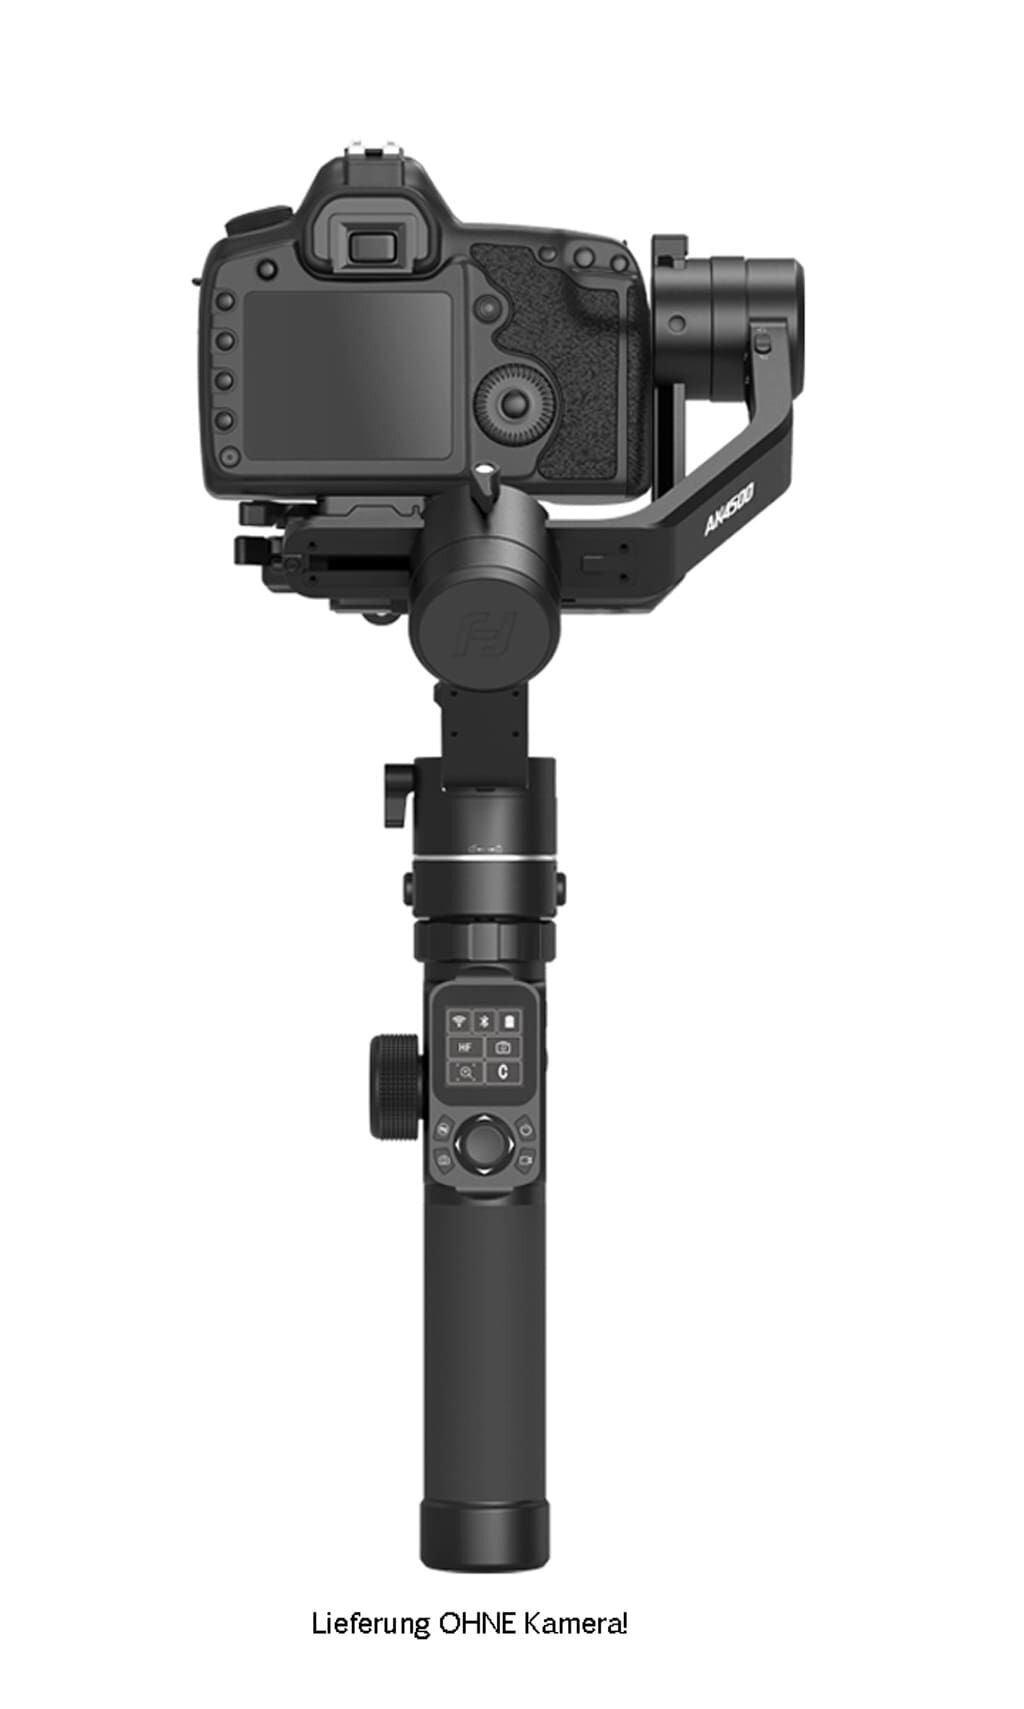 Feiyu Tech AK4500 Gimbal KIT (inkl. AKF2) für DSLR- und spiegellose Kameras